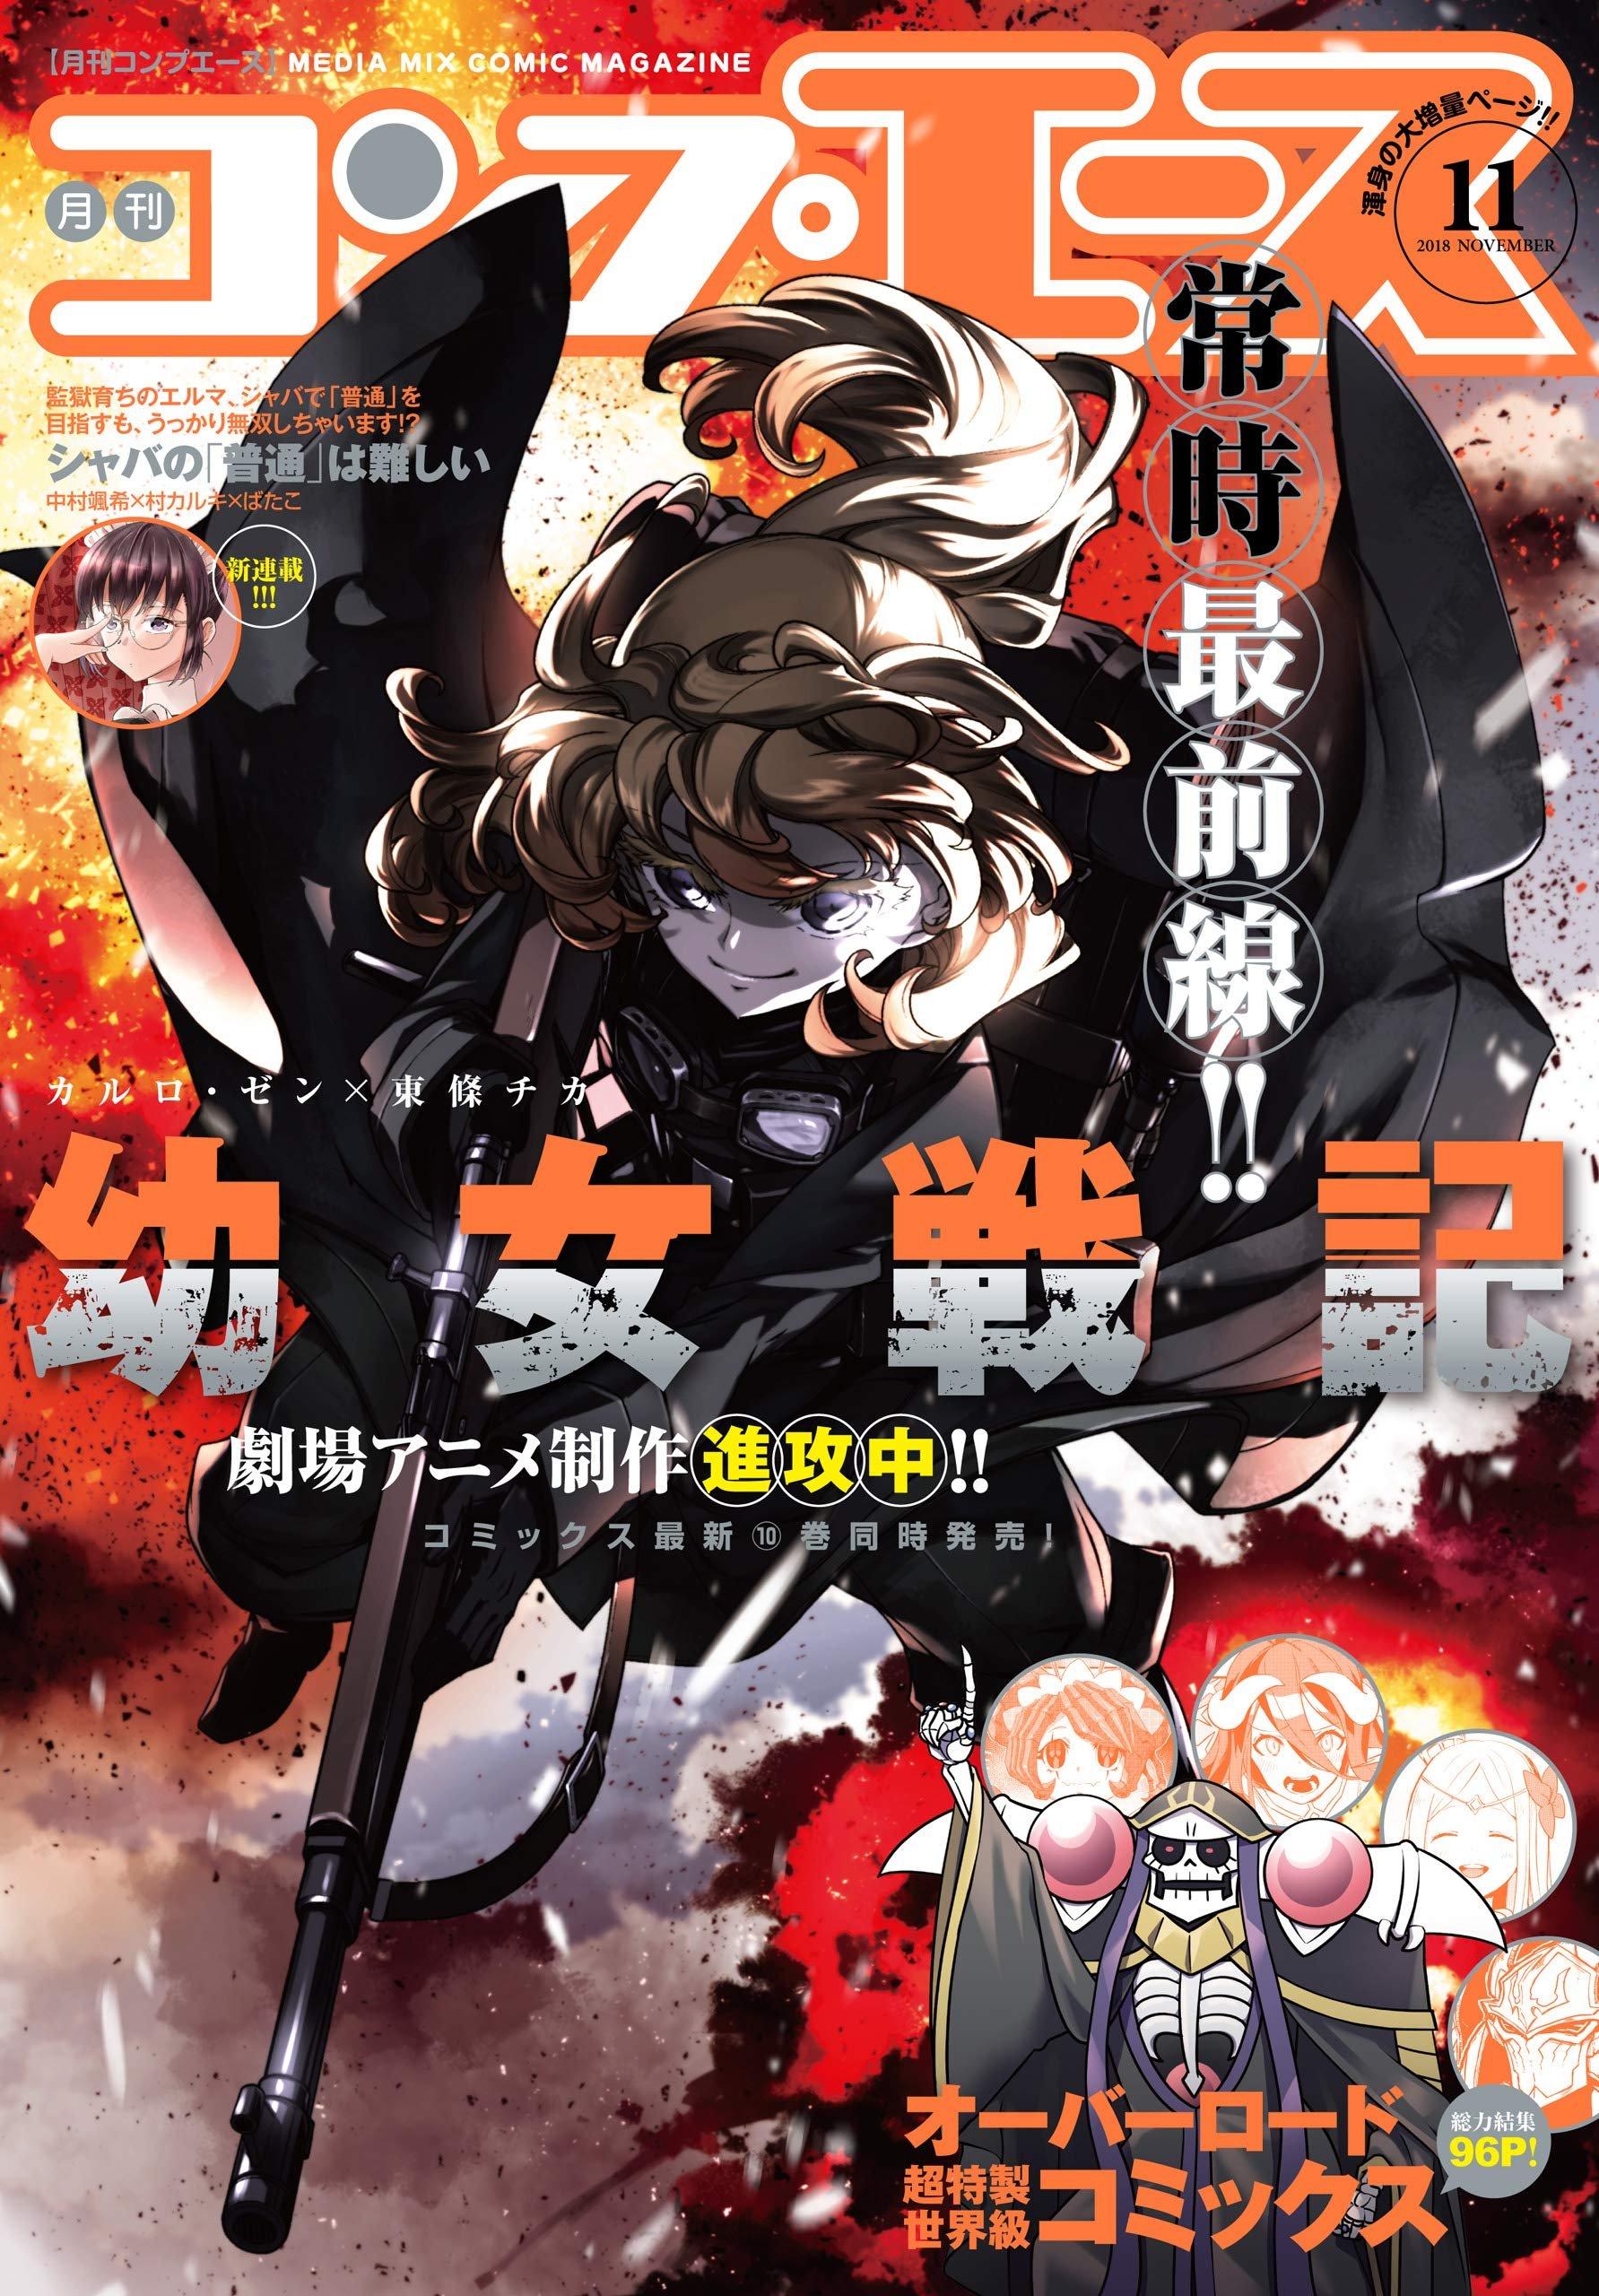 Comp Ace Issue 154 (digital) (November 2018)